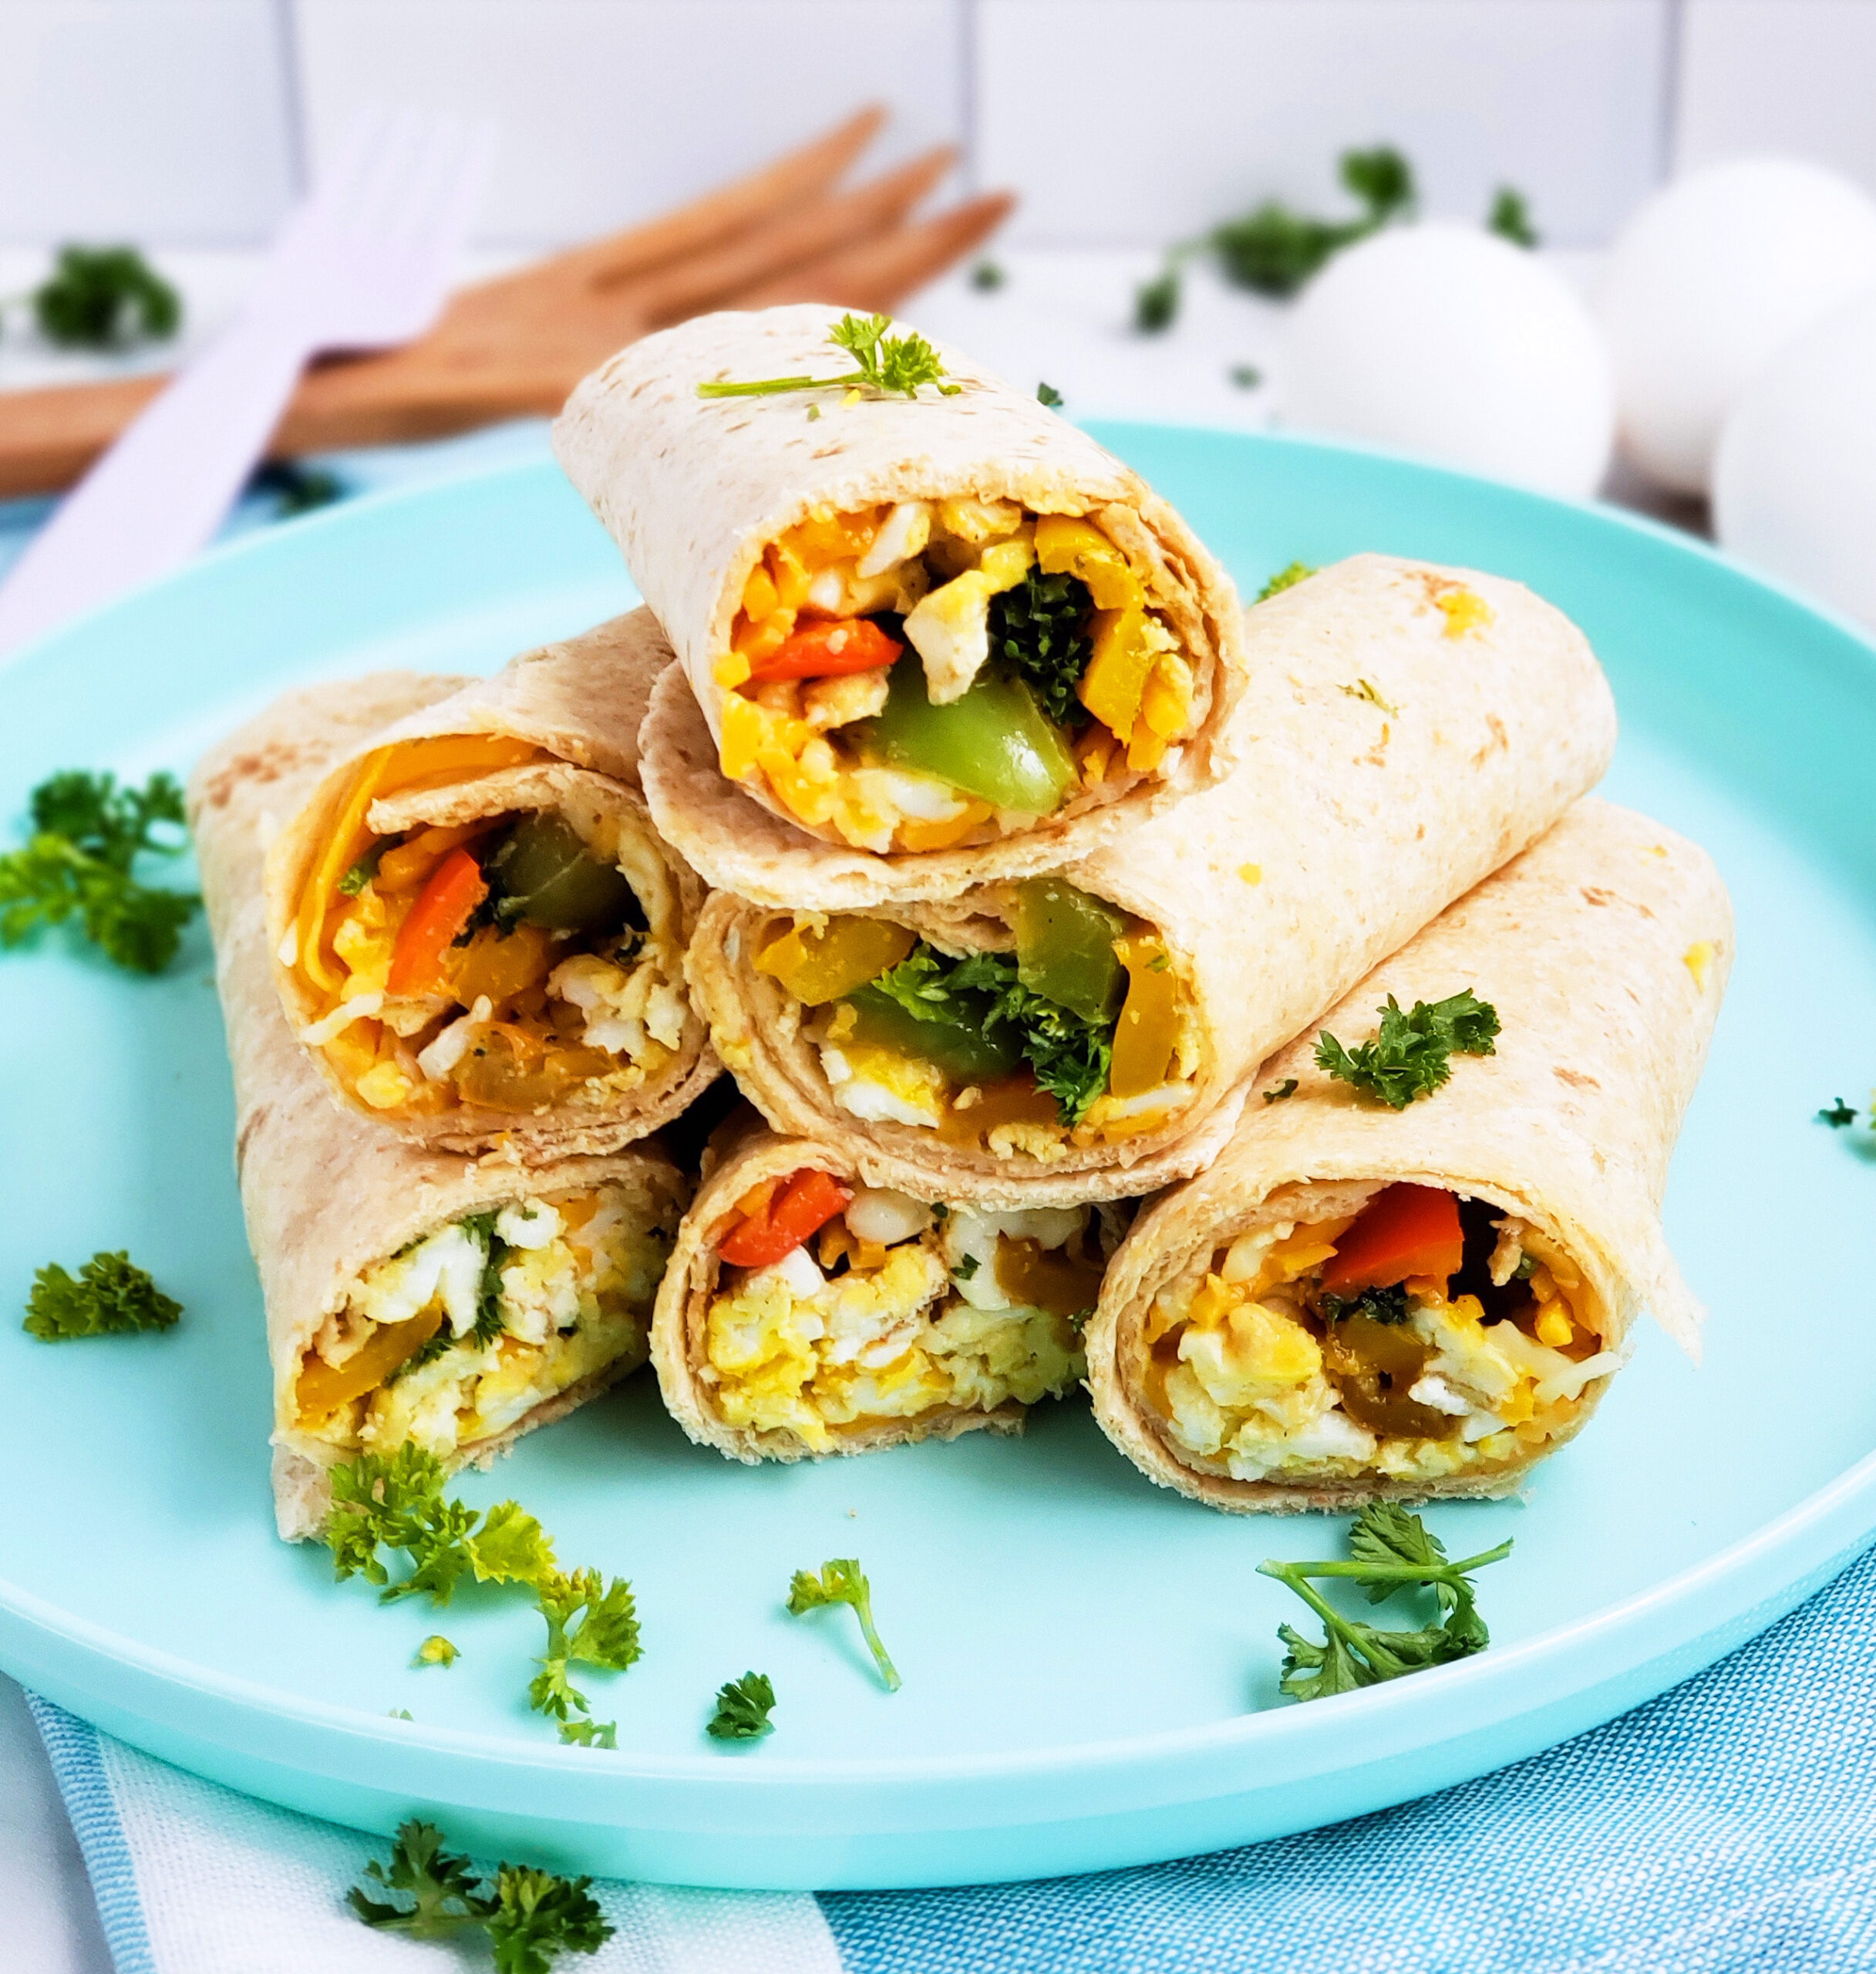 Cheesy Veggie & Egg Breakfast Roll-Ups